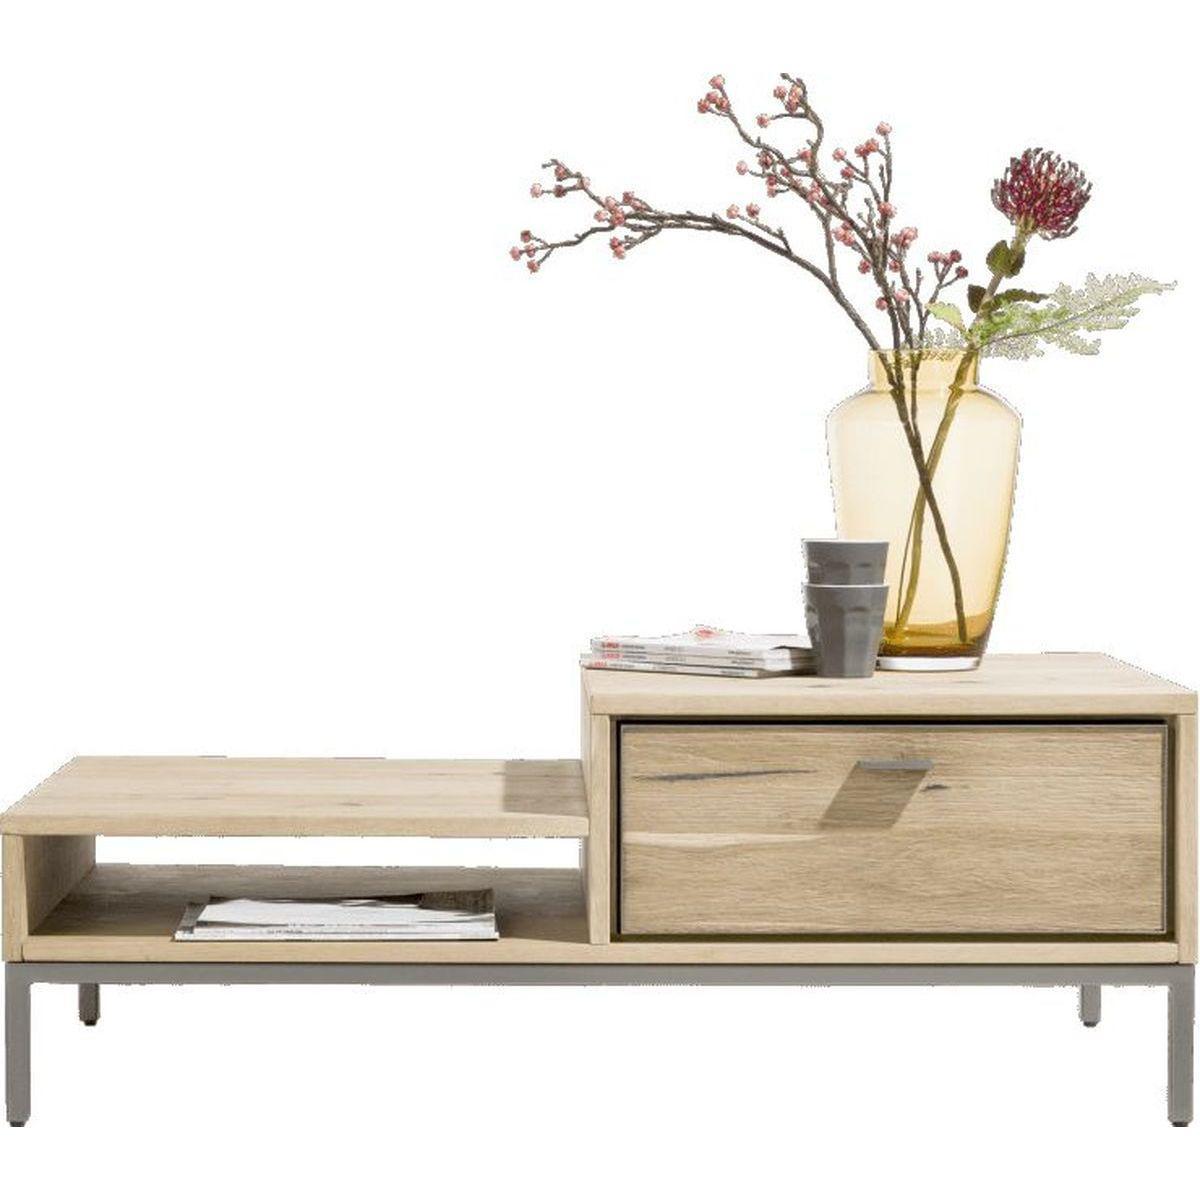 Table basse 60x110cm FANEUR Xooon